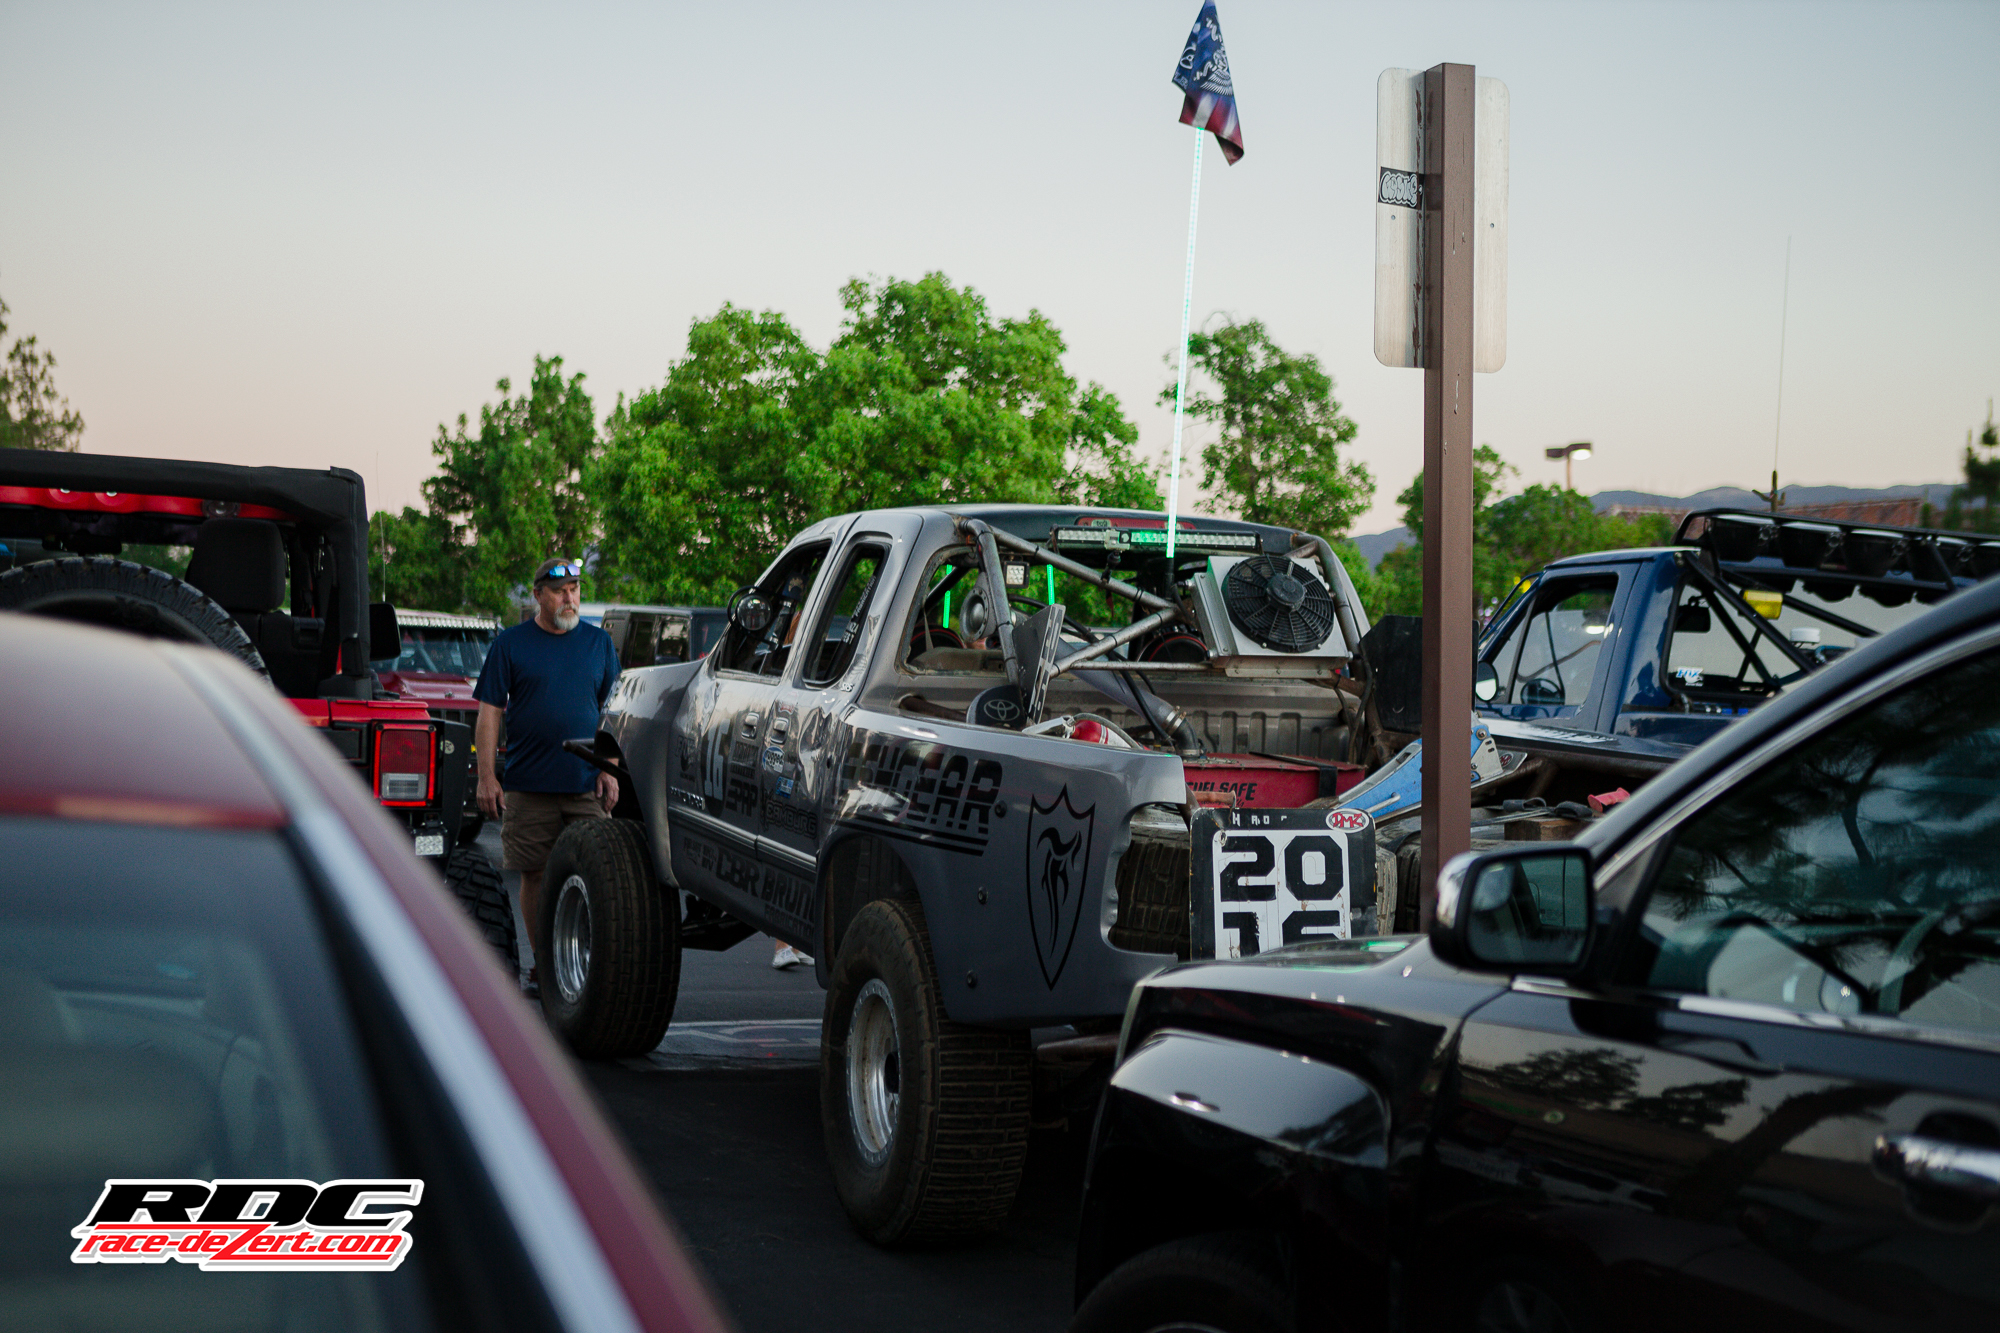 TACOS_TRUCKS_JULY_J-Stilgebouer_race_dezert-0283.jpg